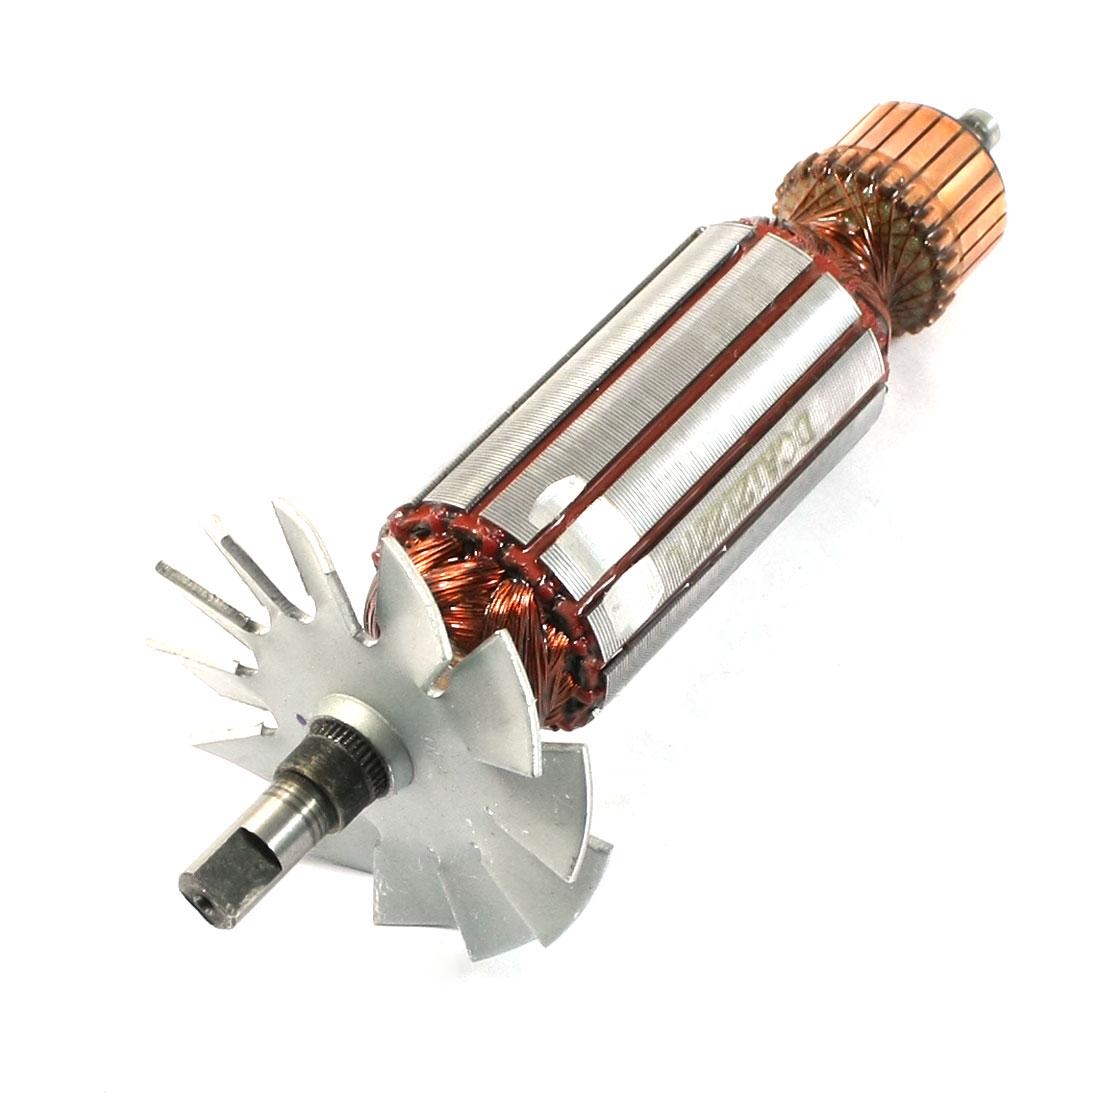 AC 220V 8mm Diameter Drive Shaft Power Tool Electric Motor Rotor for Bosch TGH-6BA